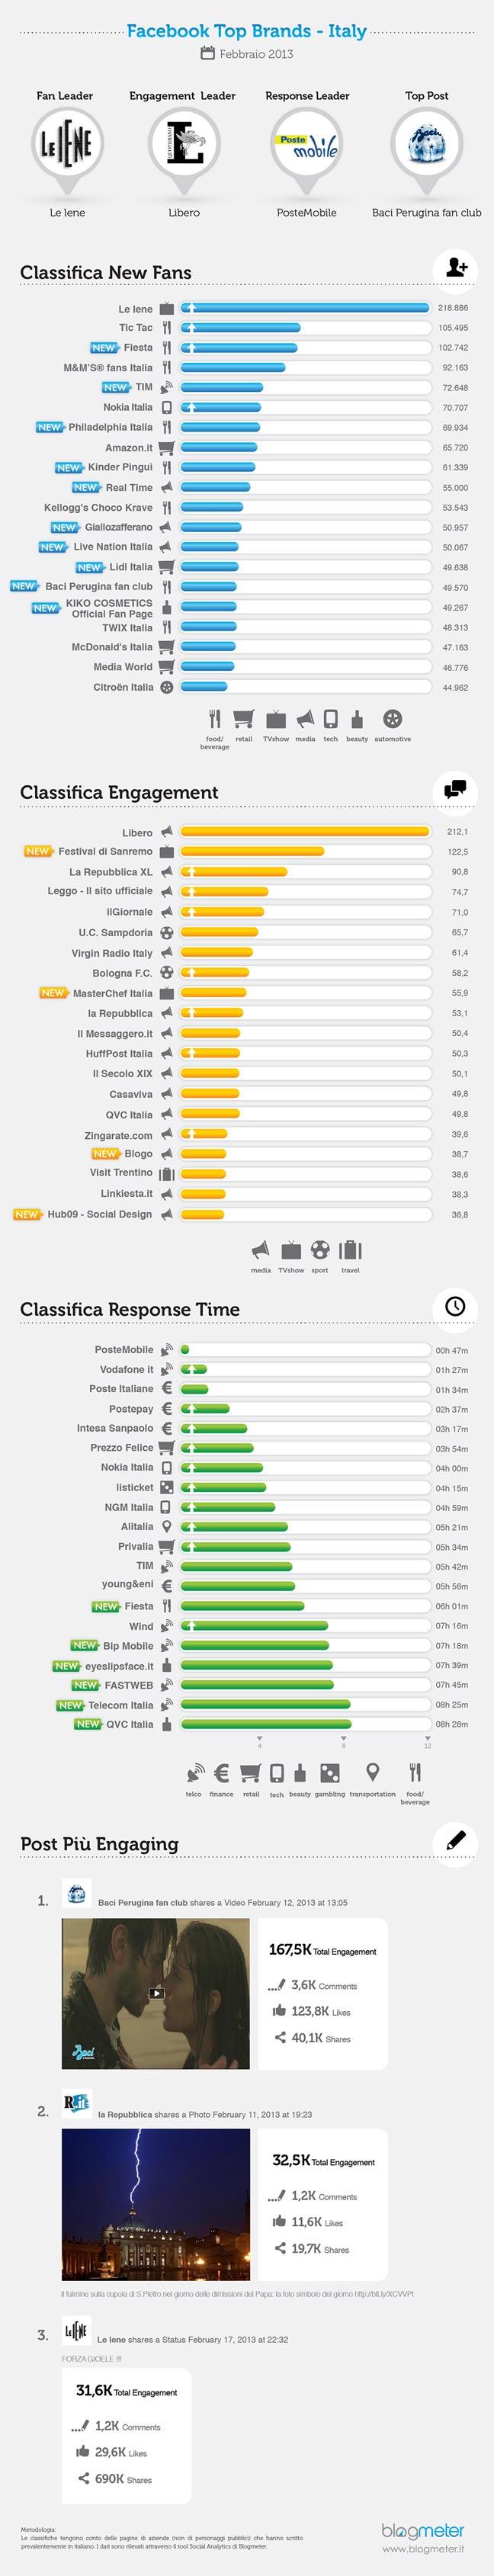 Migliori-brand-facebook-febbraio-2013